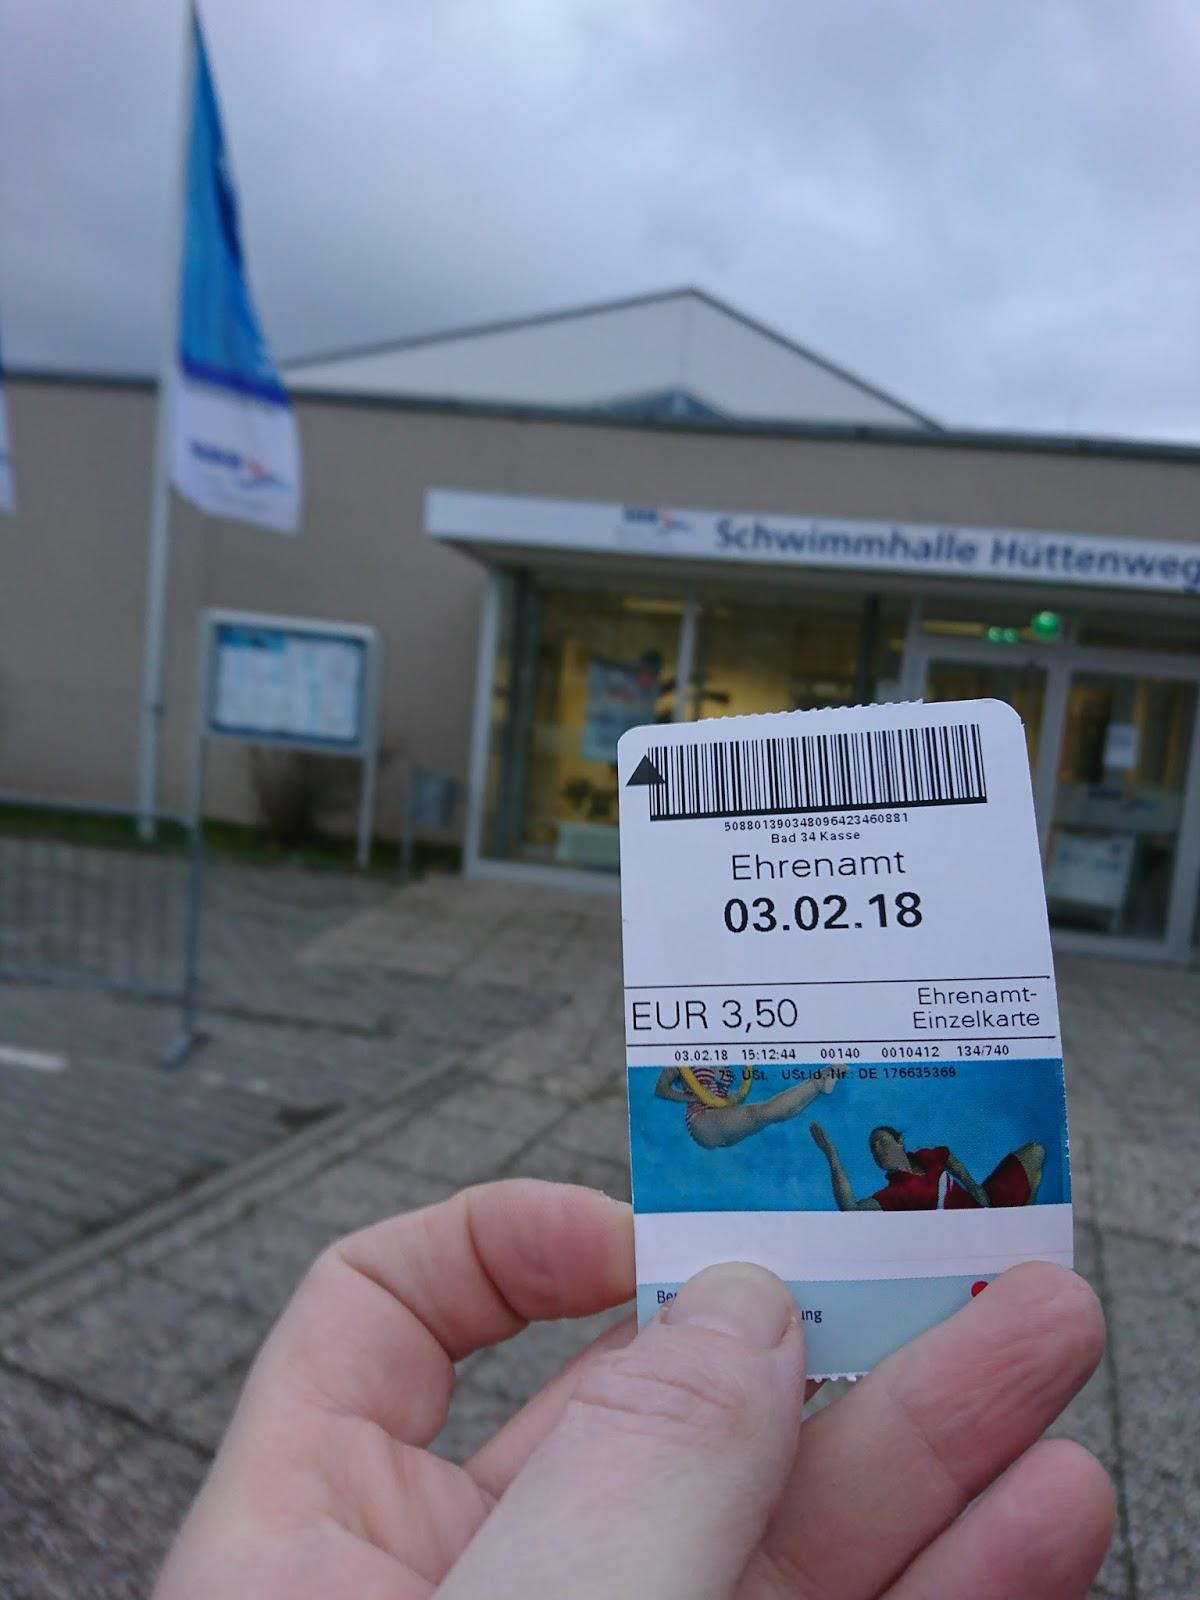 Iberty: Schwimmbad Berlin: Dahlem, Schwimmhalle Httenweg